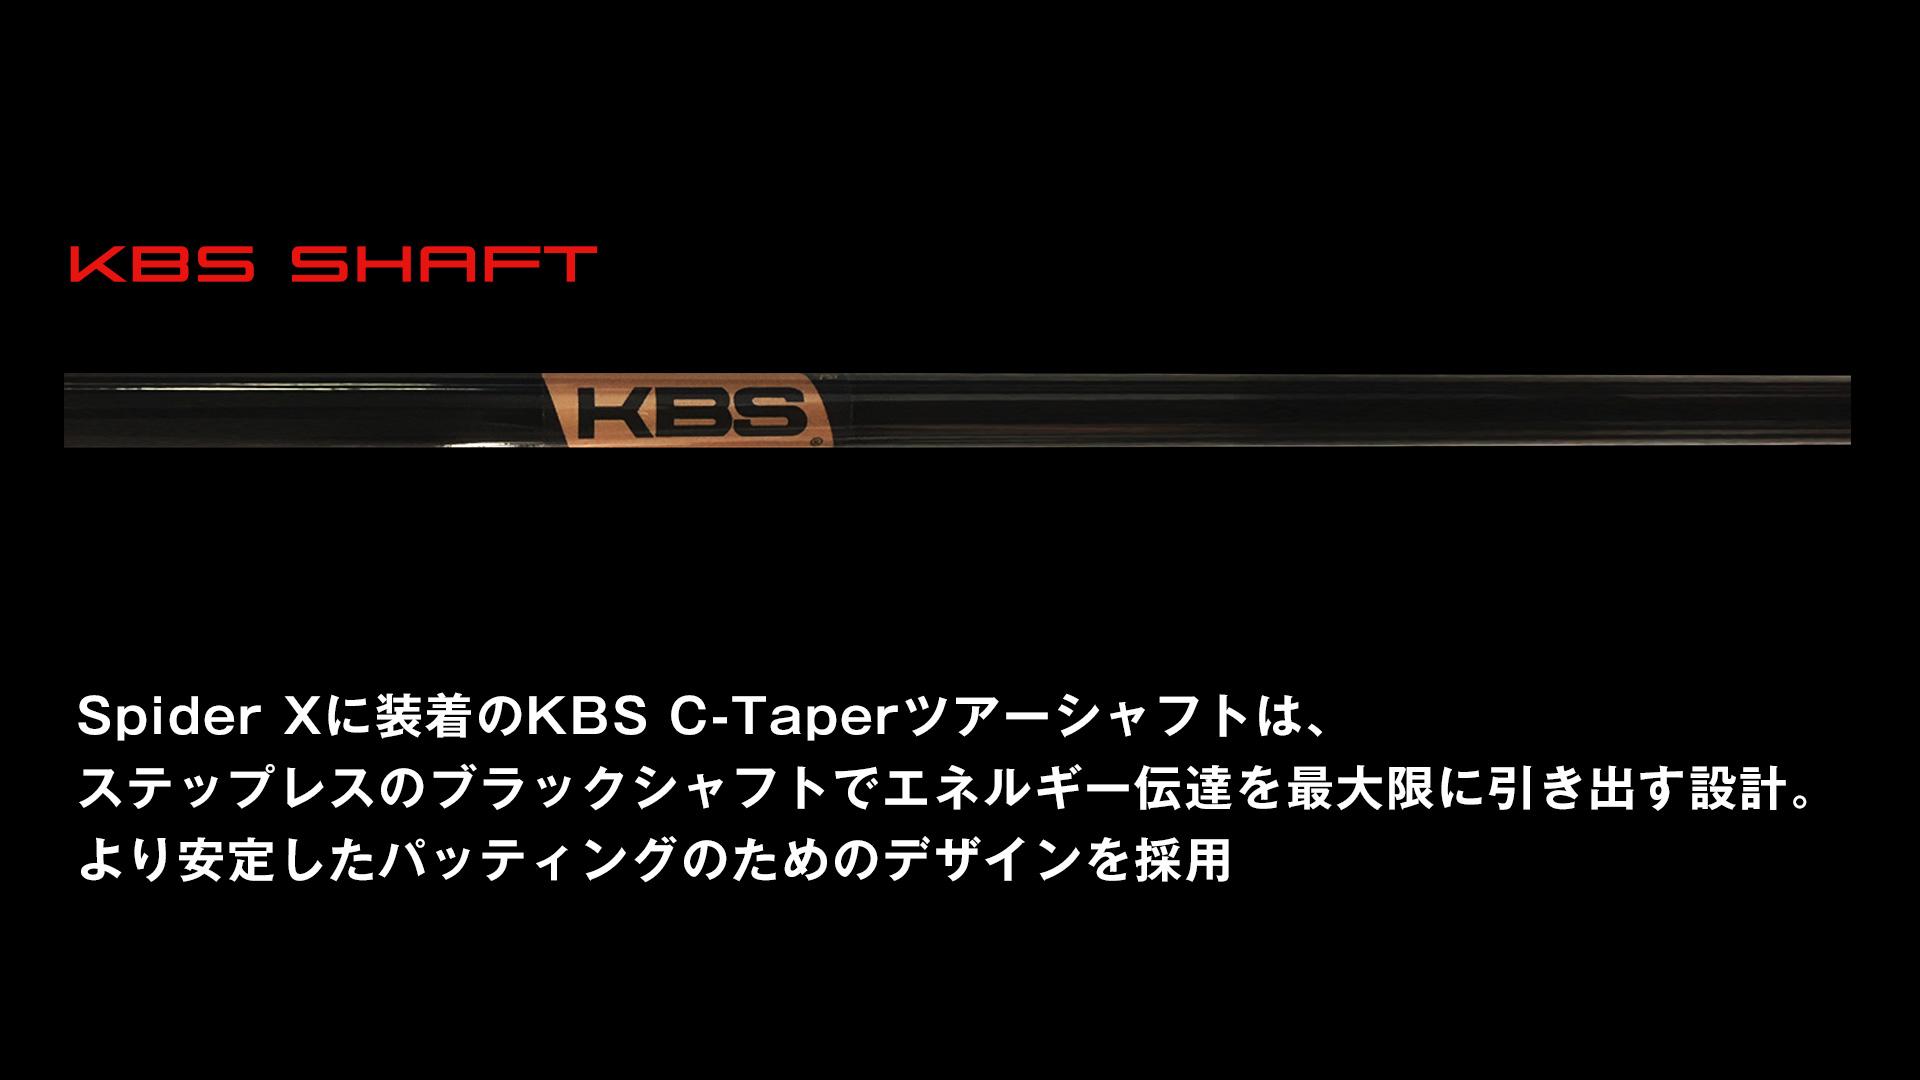 KBS C-Taperツアーシャフト